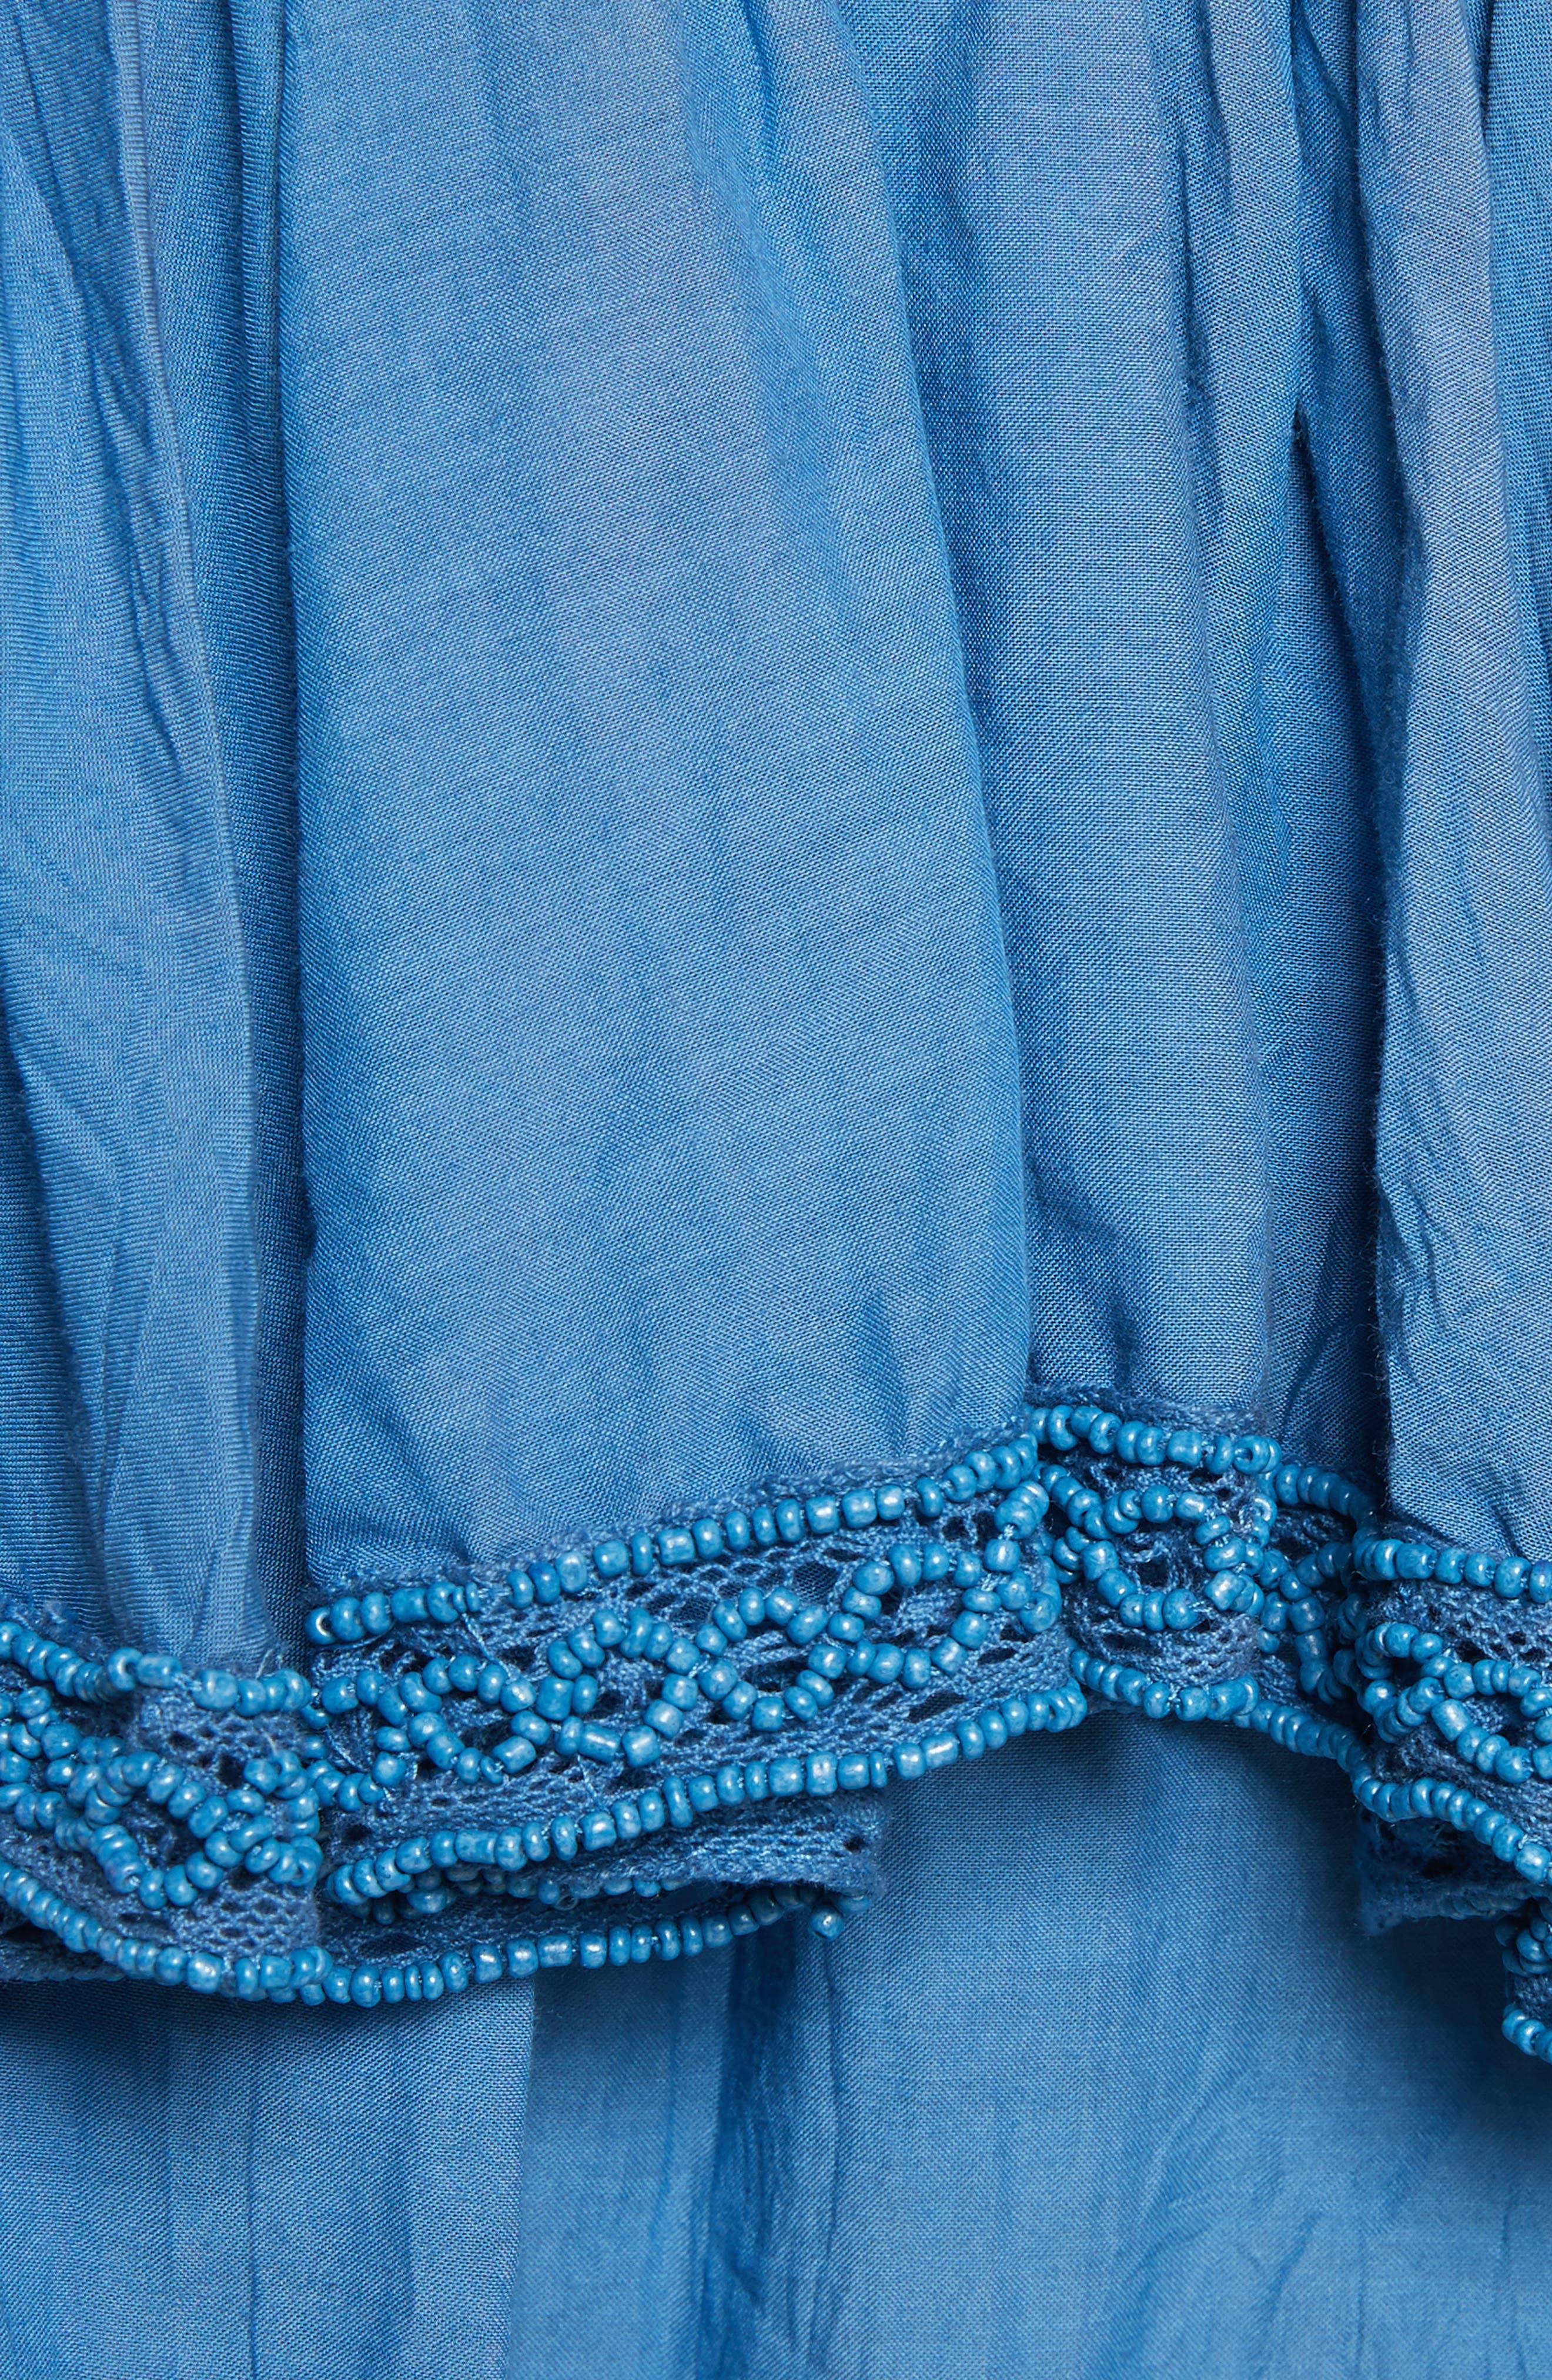 Adaline Ruffle Cotton Blouse,                             Alternate thumbnail 5, color,                             400